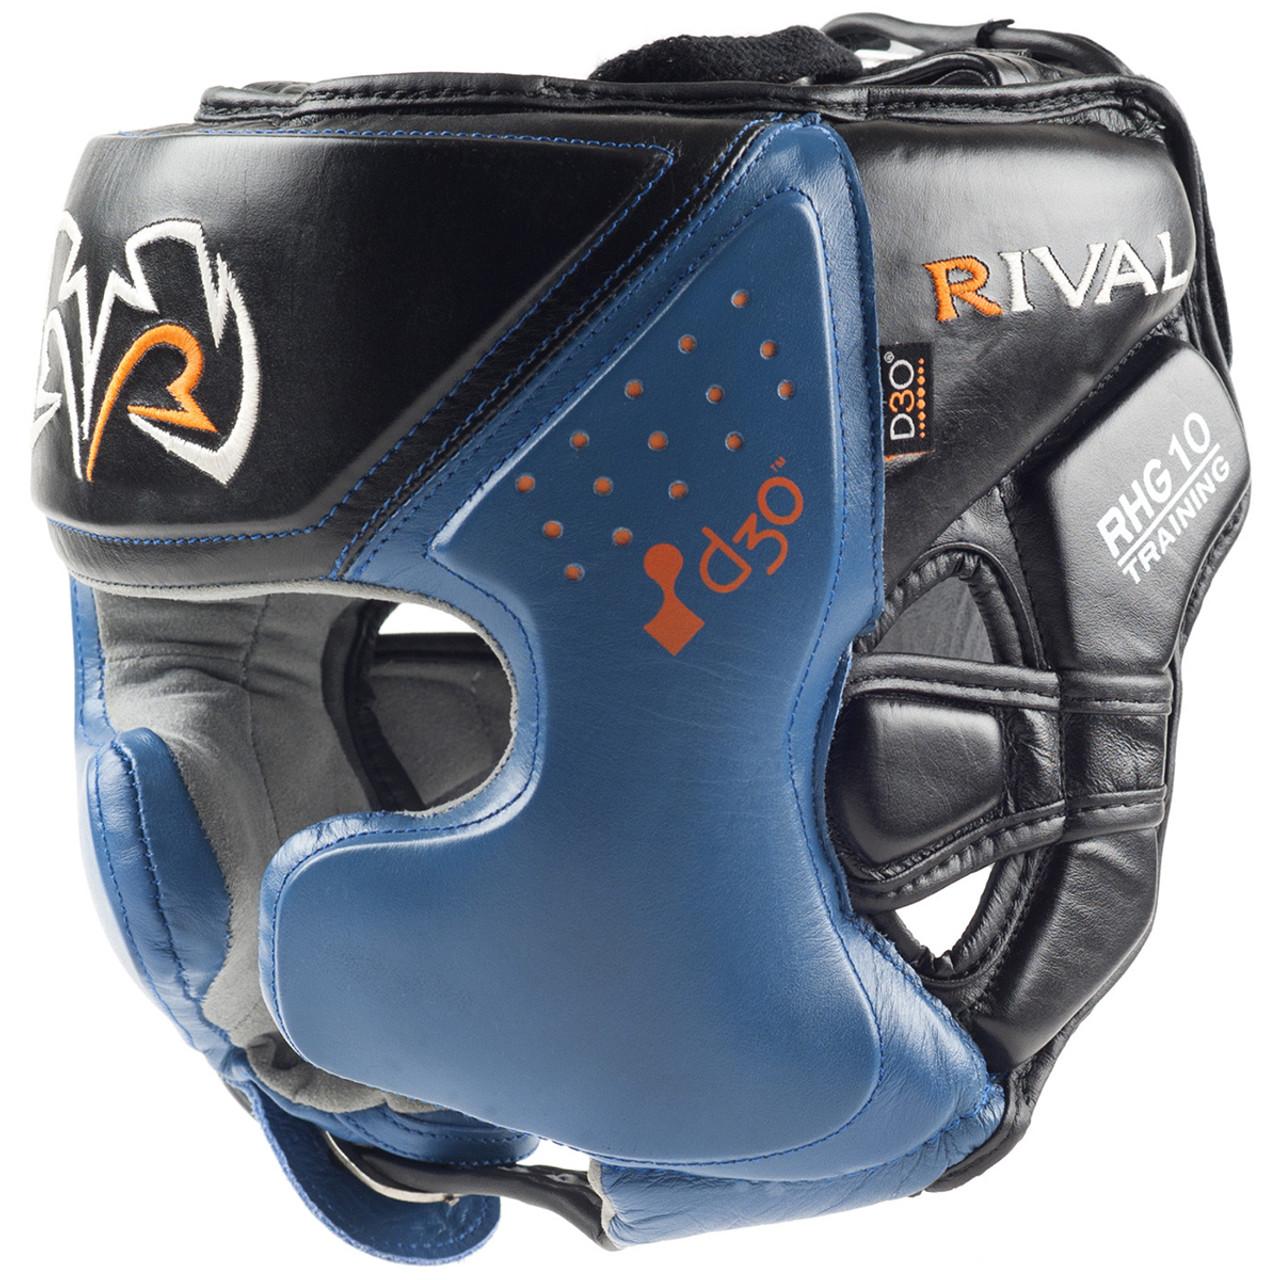 RIVAL Boxing RHG10 Intelli-Shock d30 Training Headgear